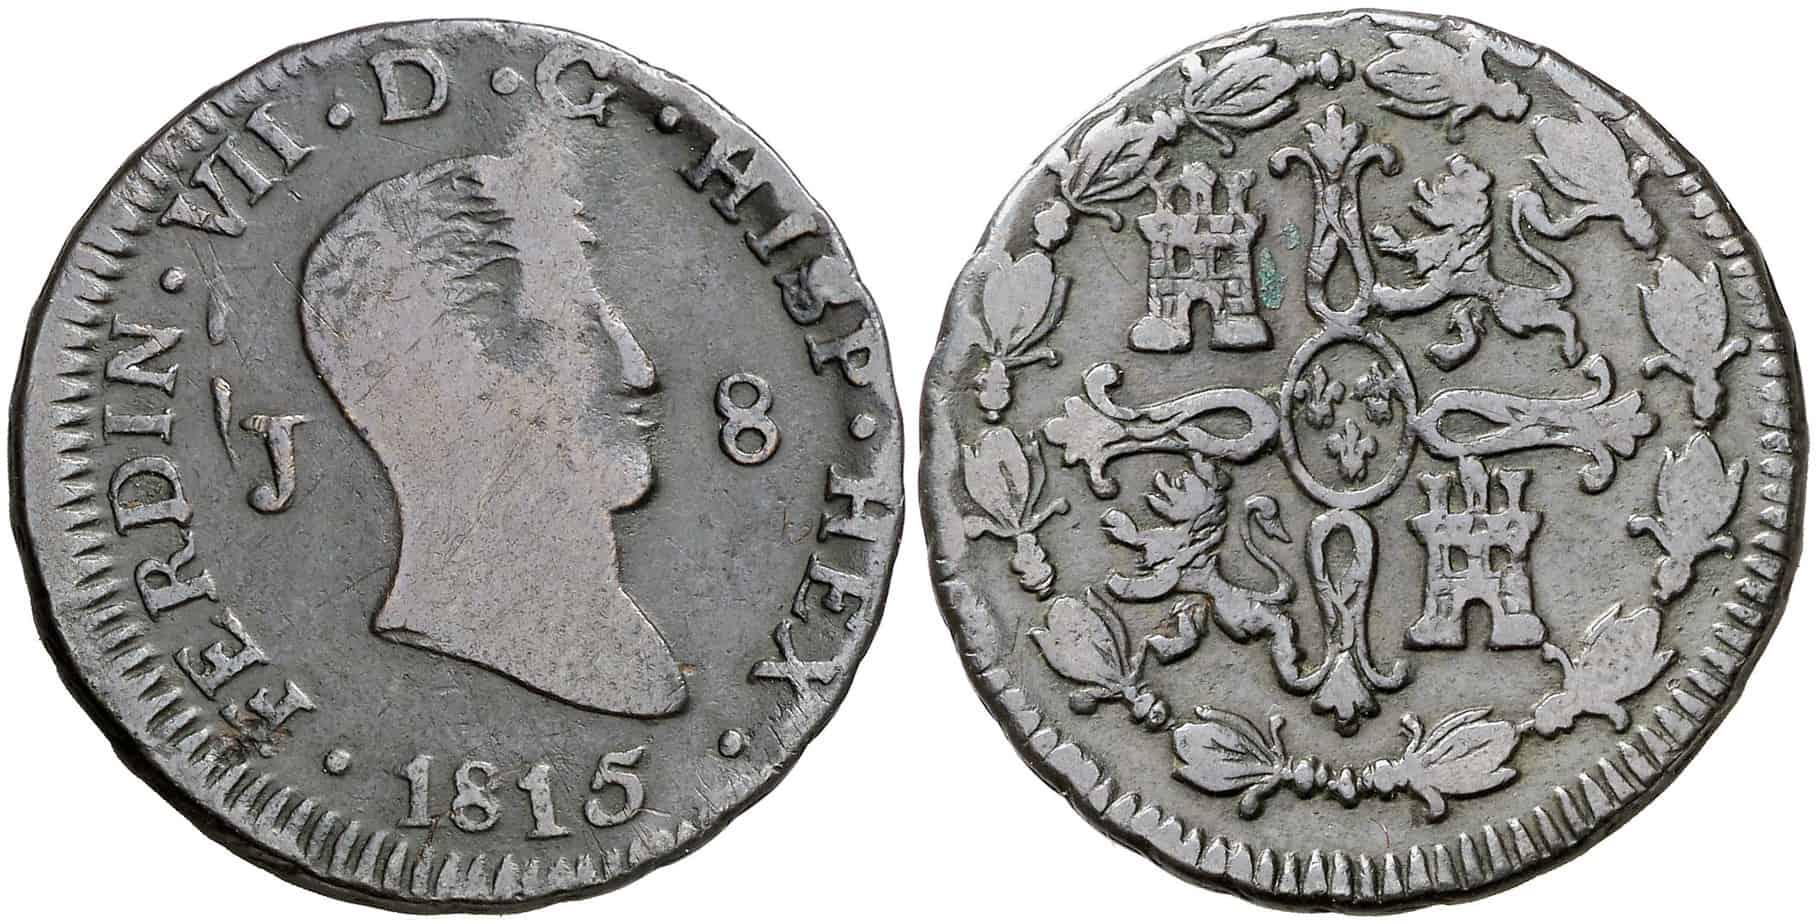 8 maravedis Jubia 1815